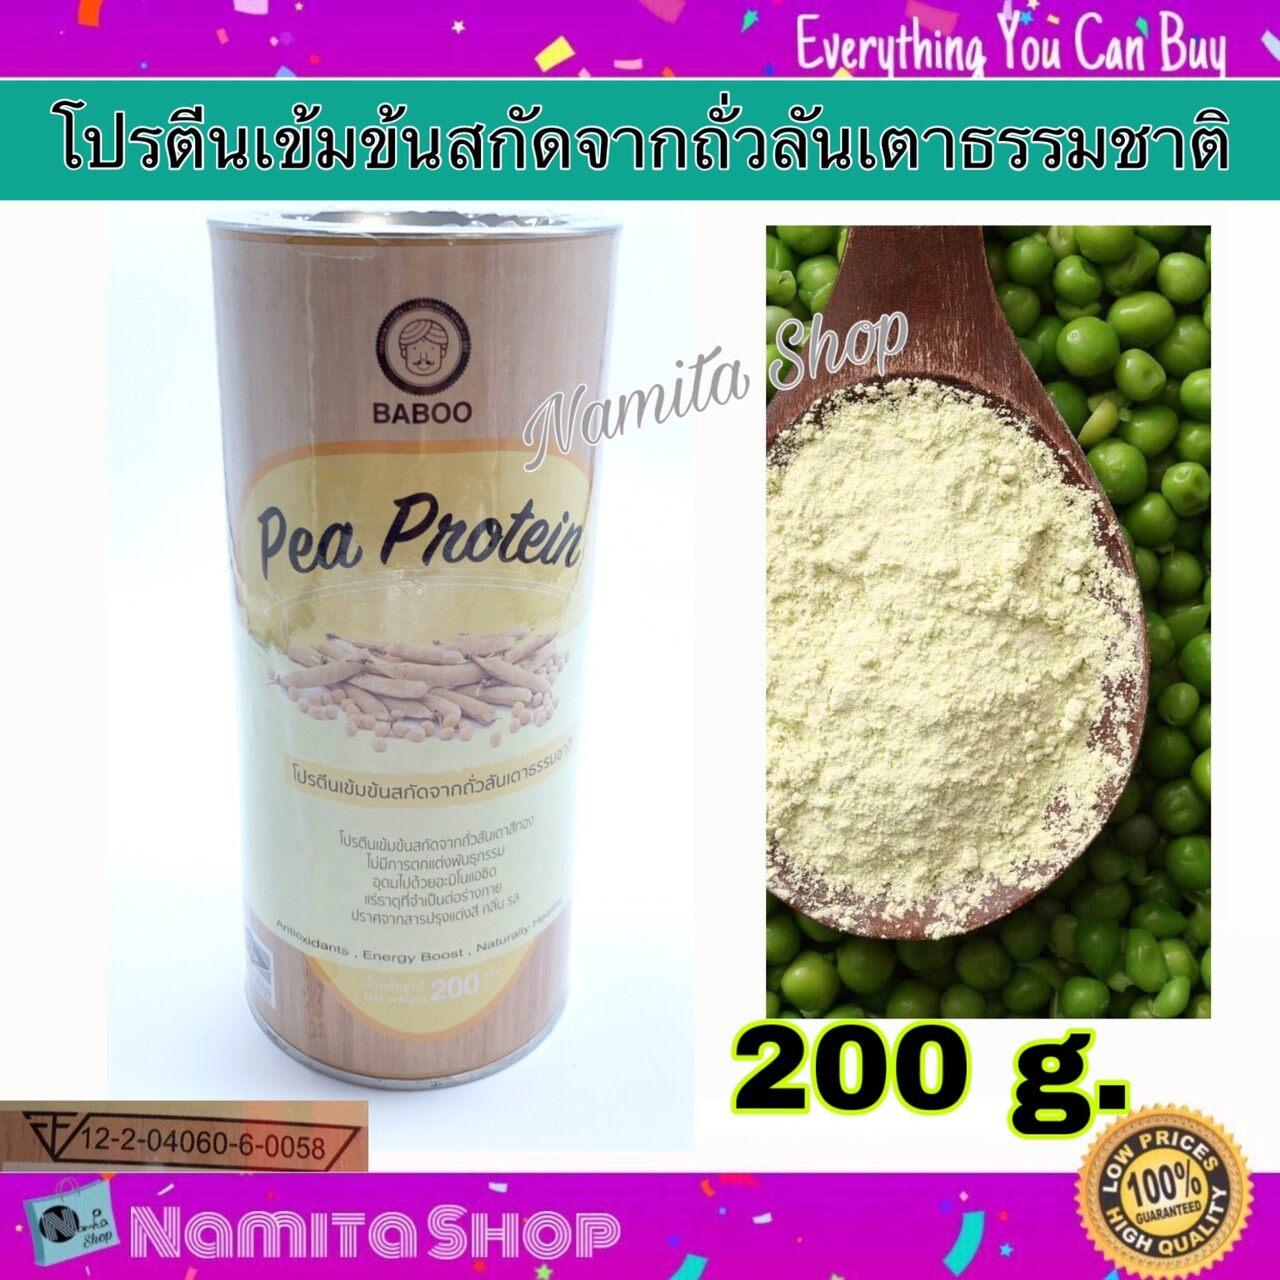 Namita Baboo Pea Protein โปรตีน โปรตีนเข้มข้นสกัดจากถั่วลันเตาธรรมชาติ ชนิดผง ขนาด 200 G..